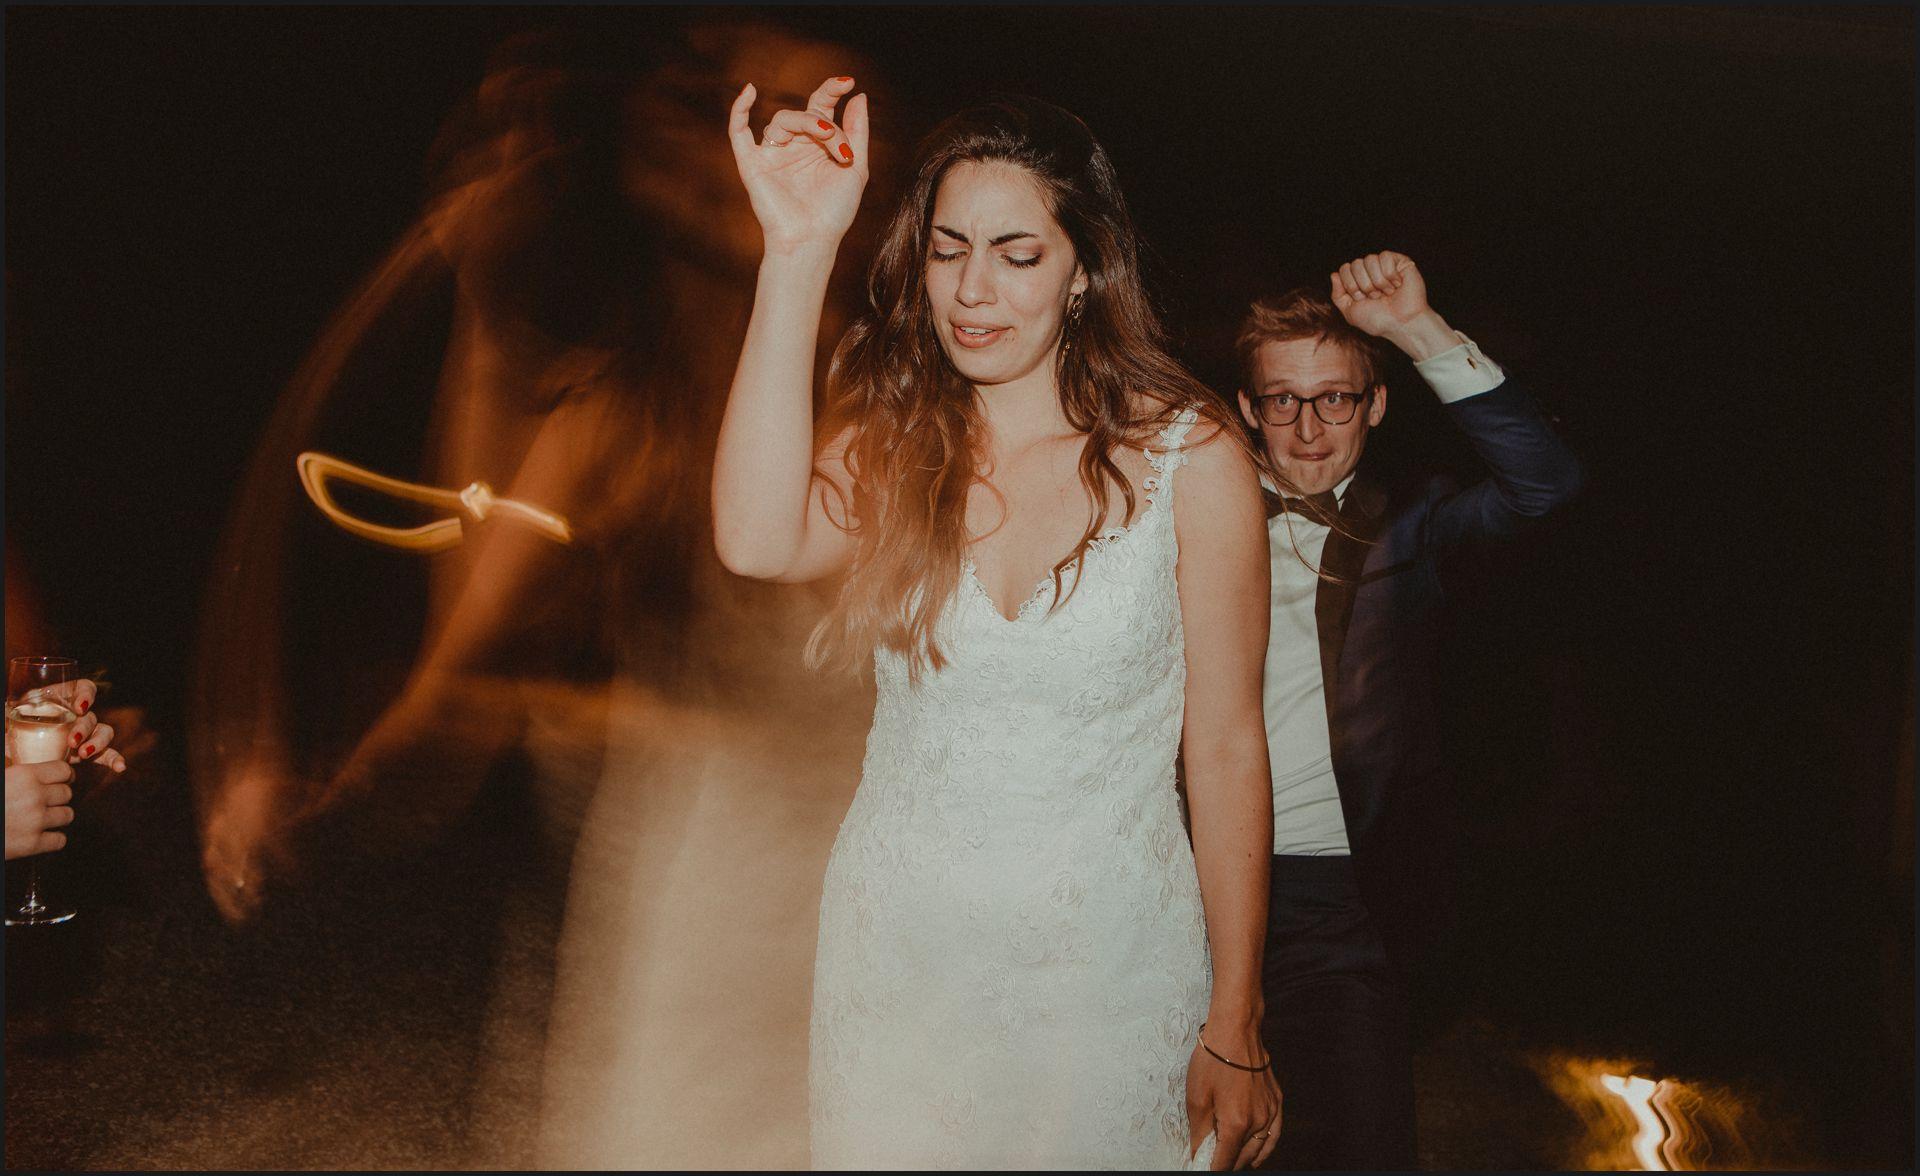 first dance, bride, groom, wedding, umbria, nikis resort, dance, funny, bride, groom